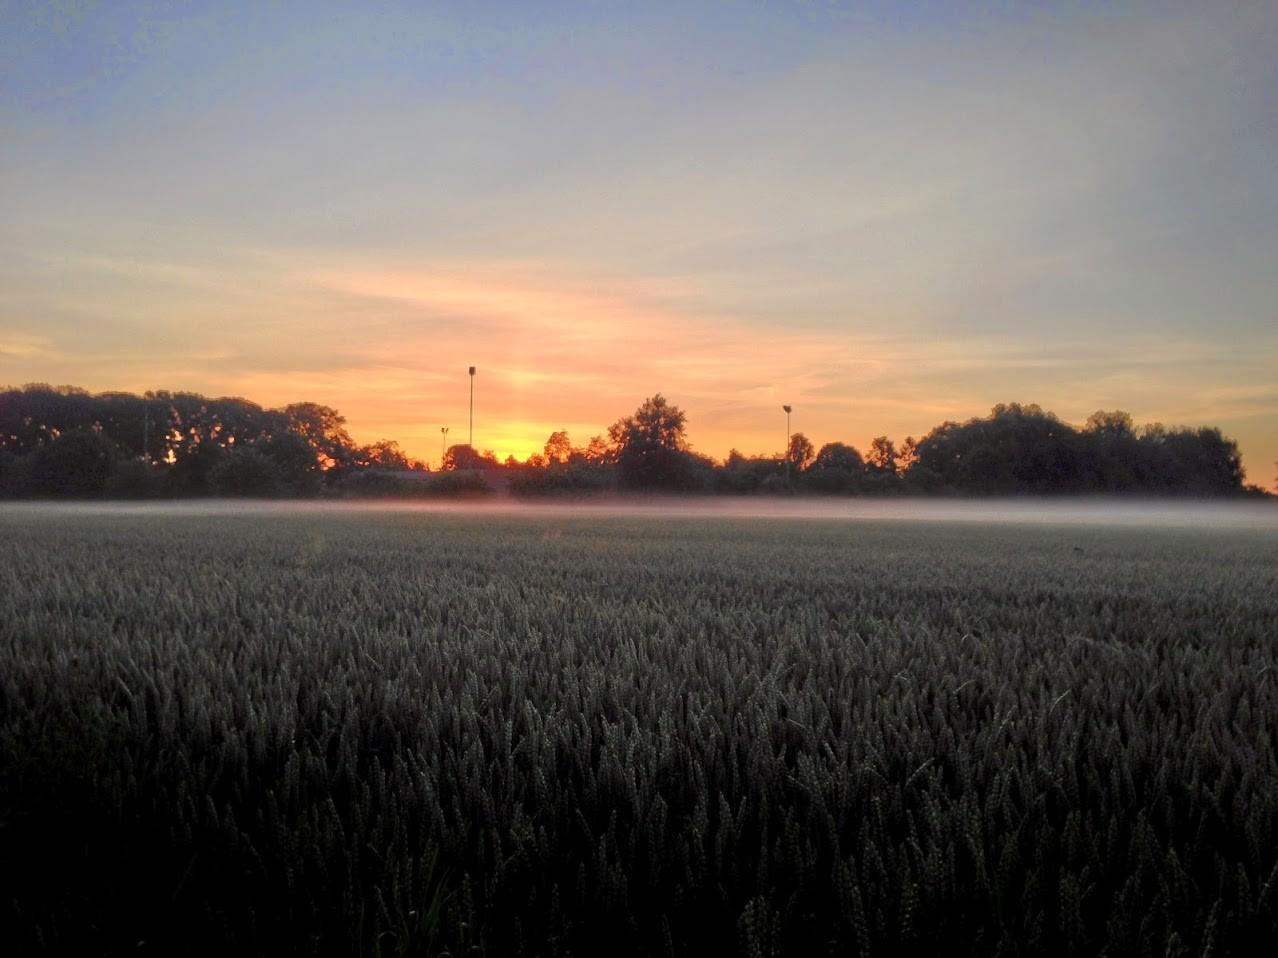 ~ Bild: Frostige Sonne ~